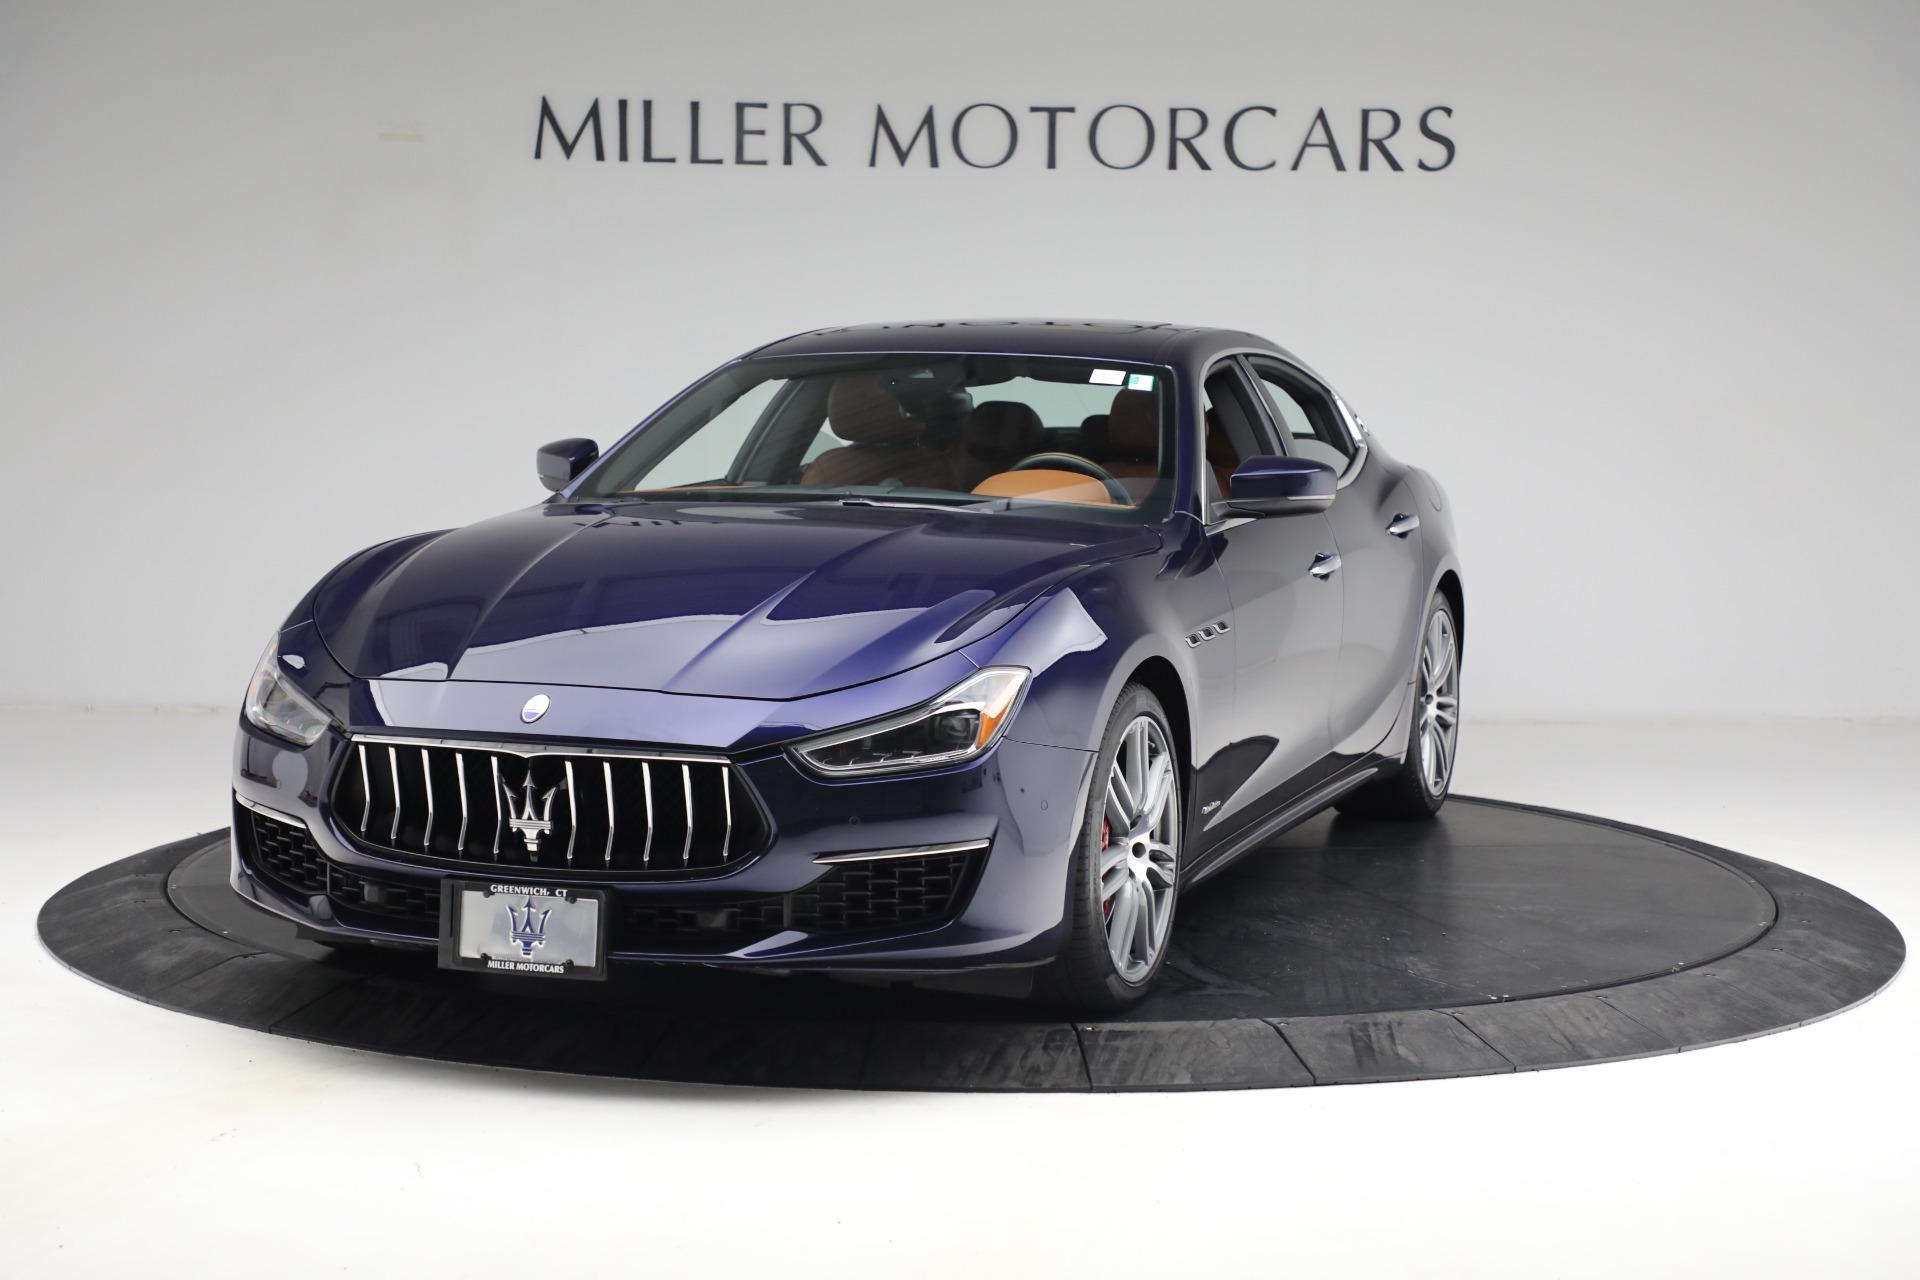 Used 2018 Maserati Ghibli S Q4 GranLusso for sale $56,900 at Alfa Romeo of Greenwich in Greenwich CT 06830 1